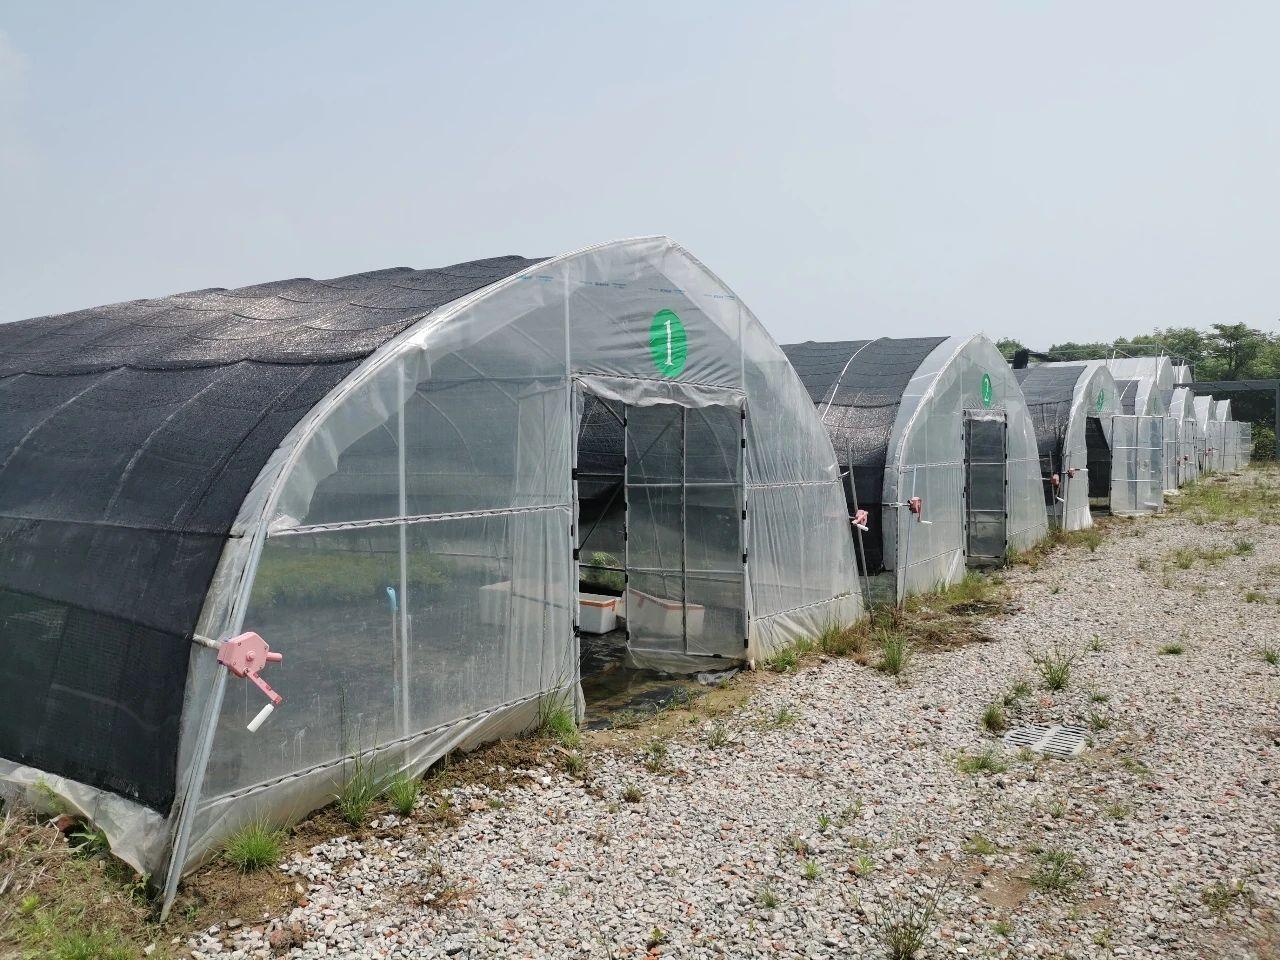 serre hydroponique en plastique carbonate tunnel sous forme de tunnel en vente buy serre tunnel a vendre serre hydroponique en plastique